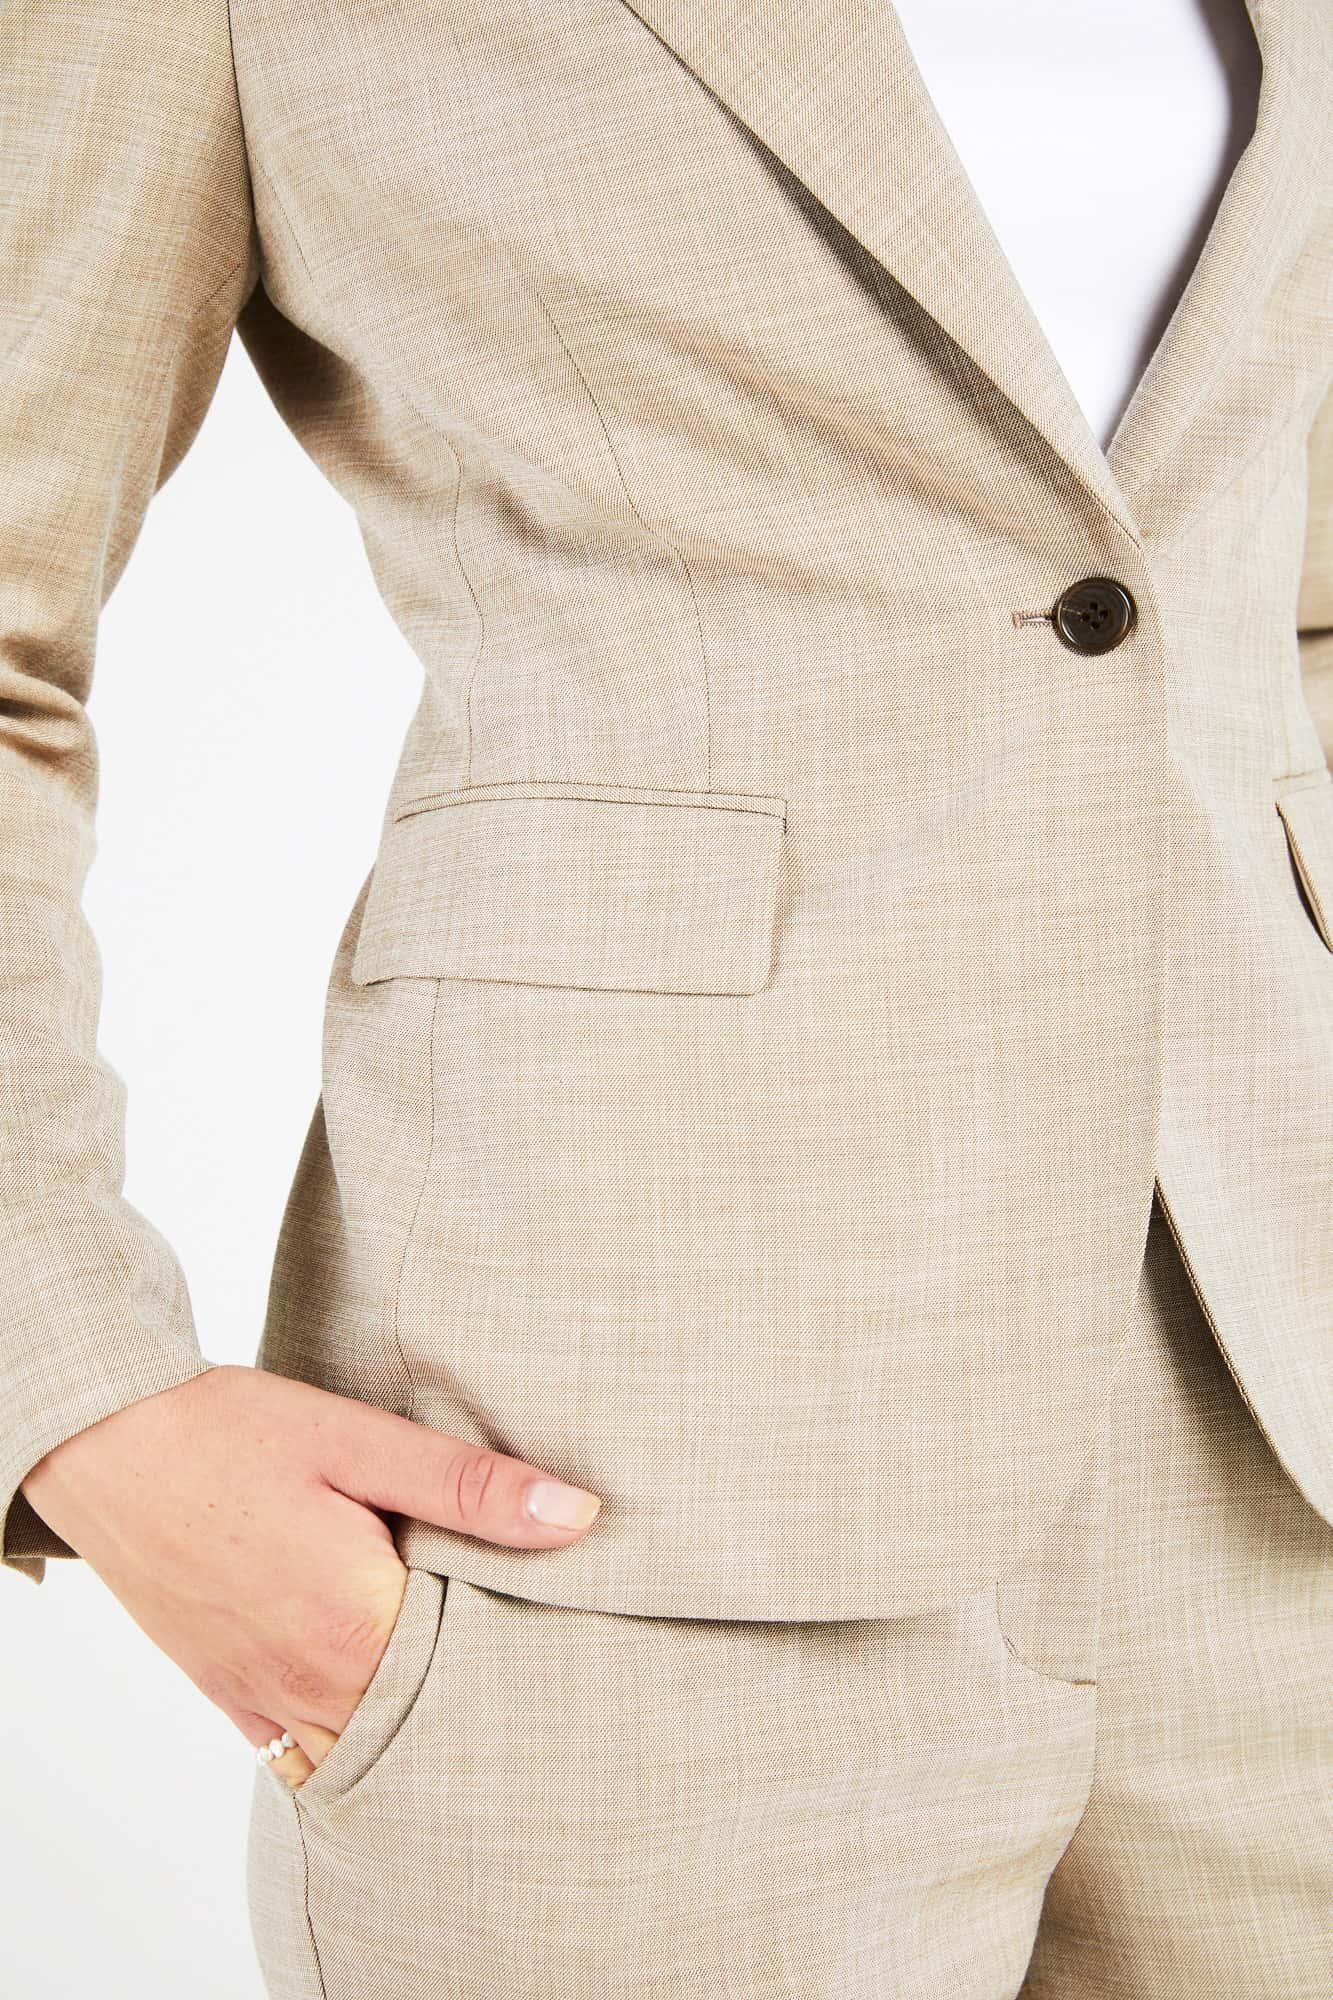 InStitchu Collection The Blackburn Beige Textured Jacket